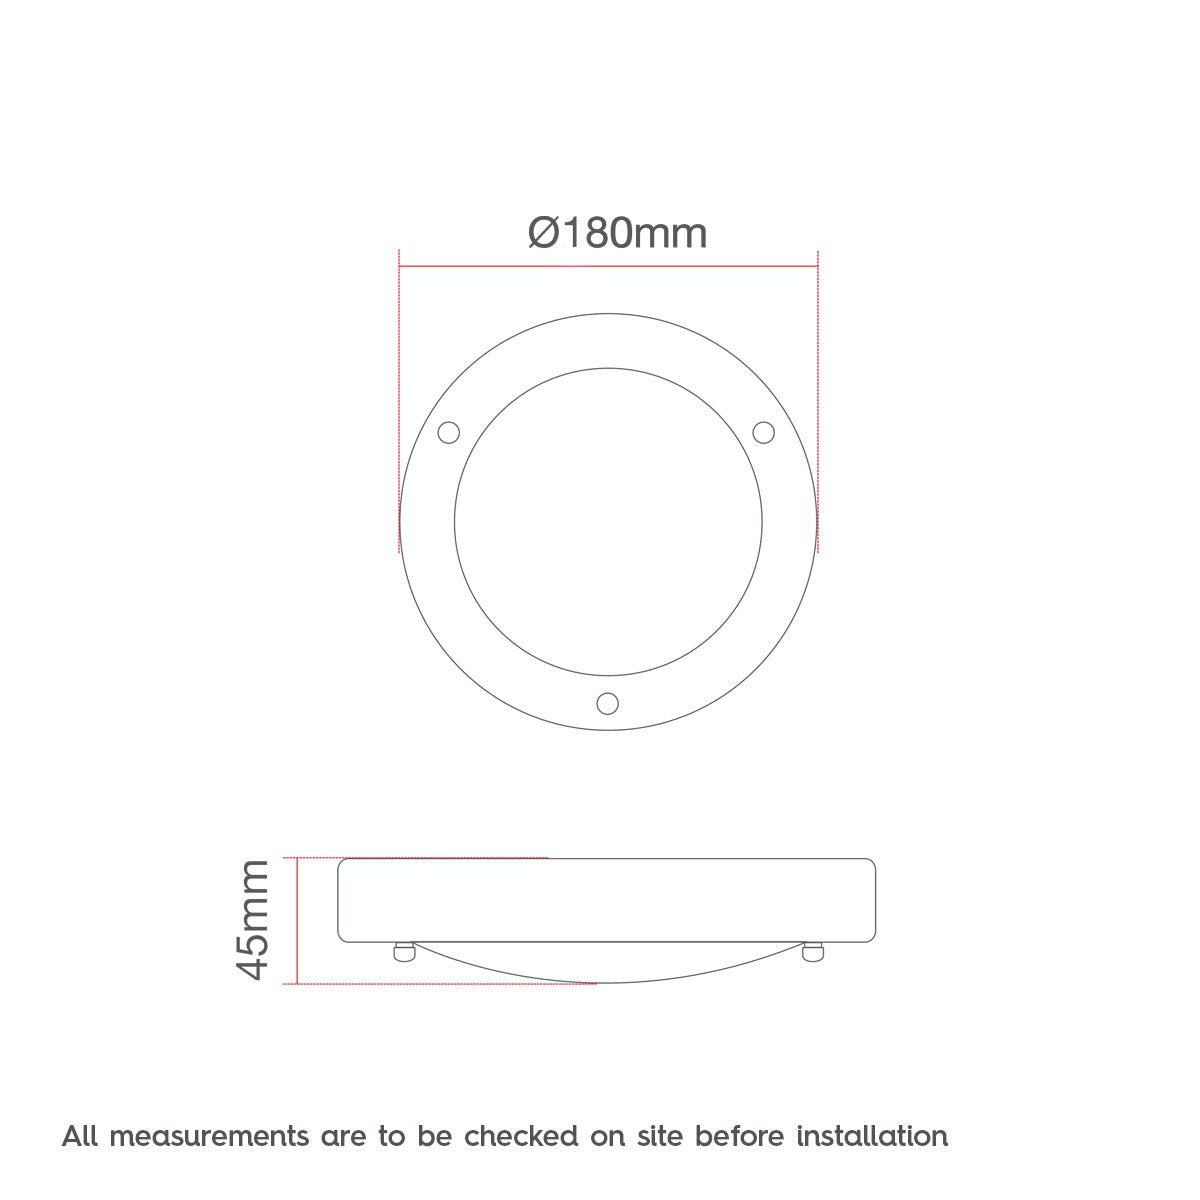 Dimensions for Forum Llum small round flush bathroom ceiling light